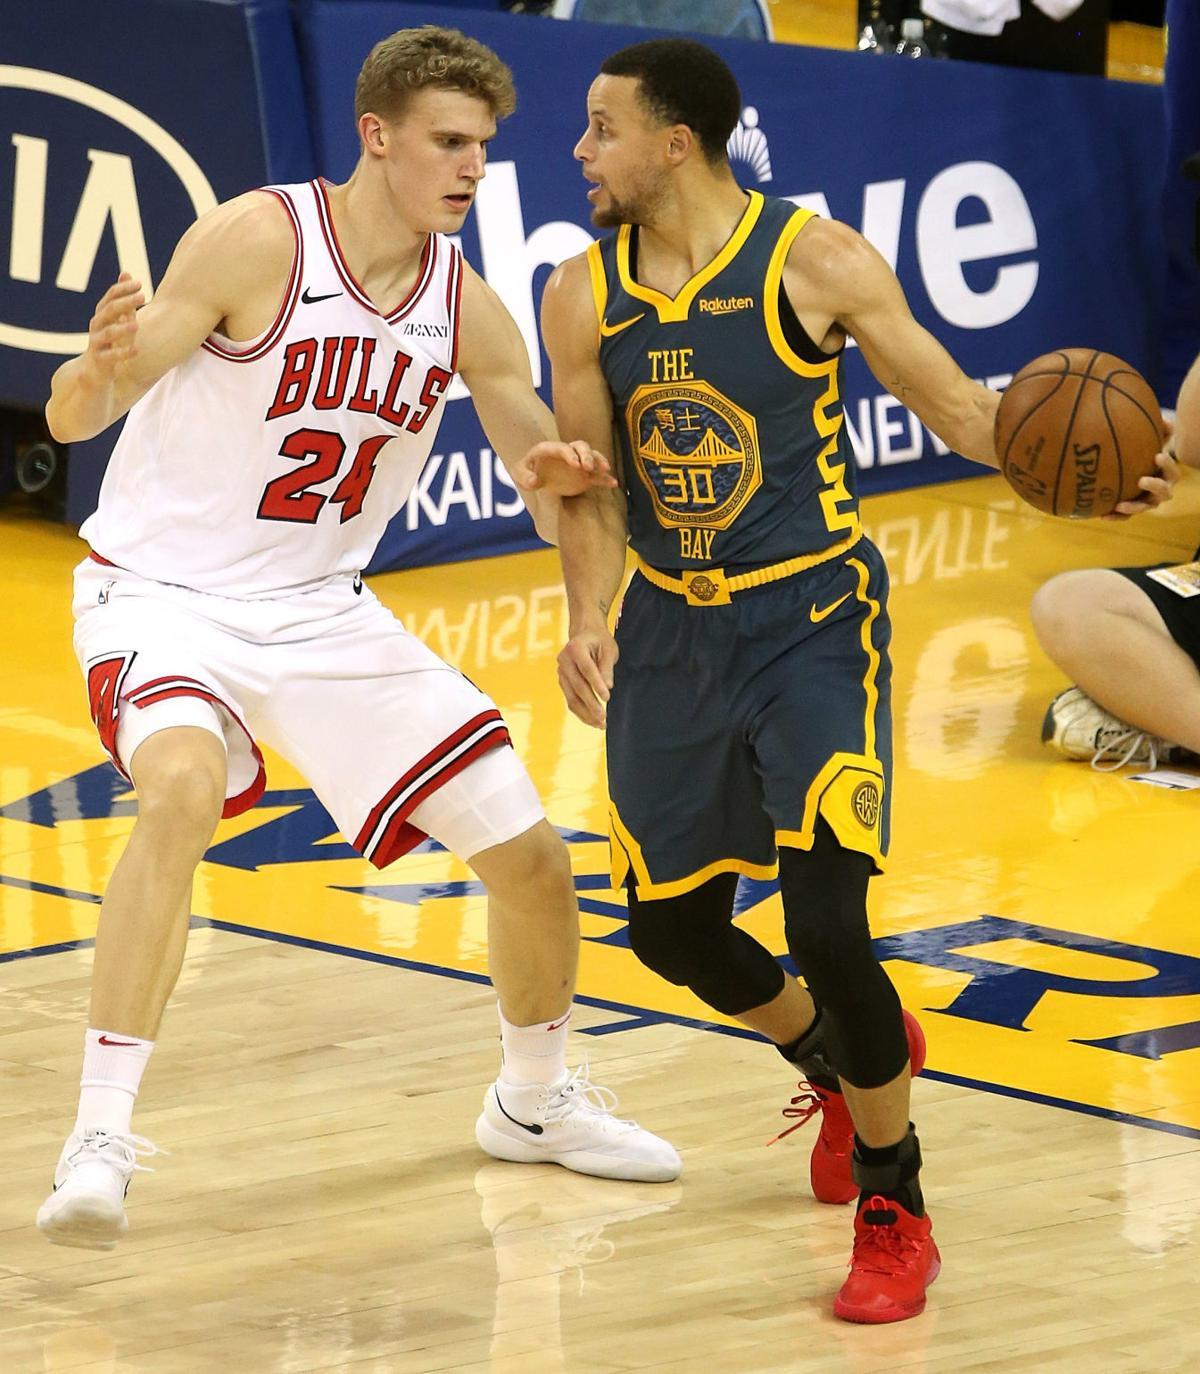 Golden State Warriors vs. Chicago Bulls NBA basketball (copy)